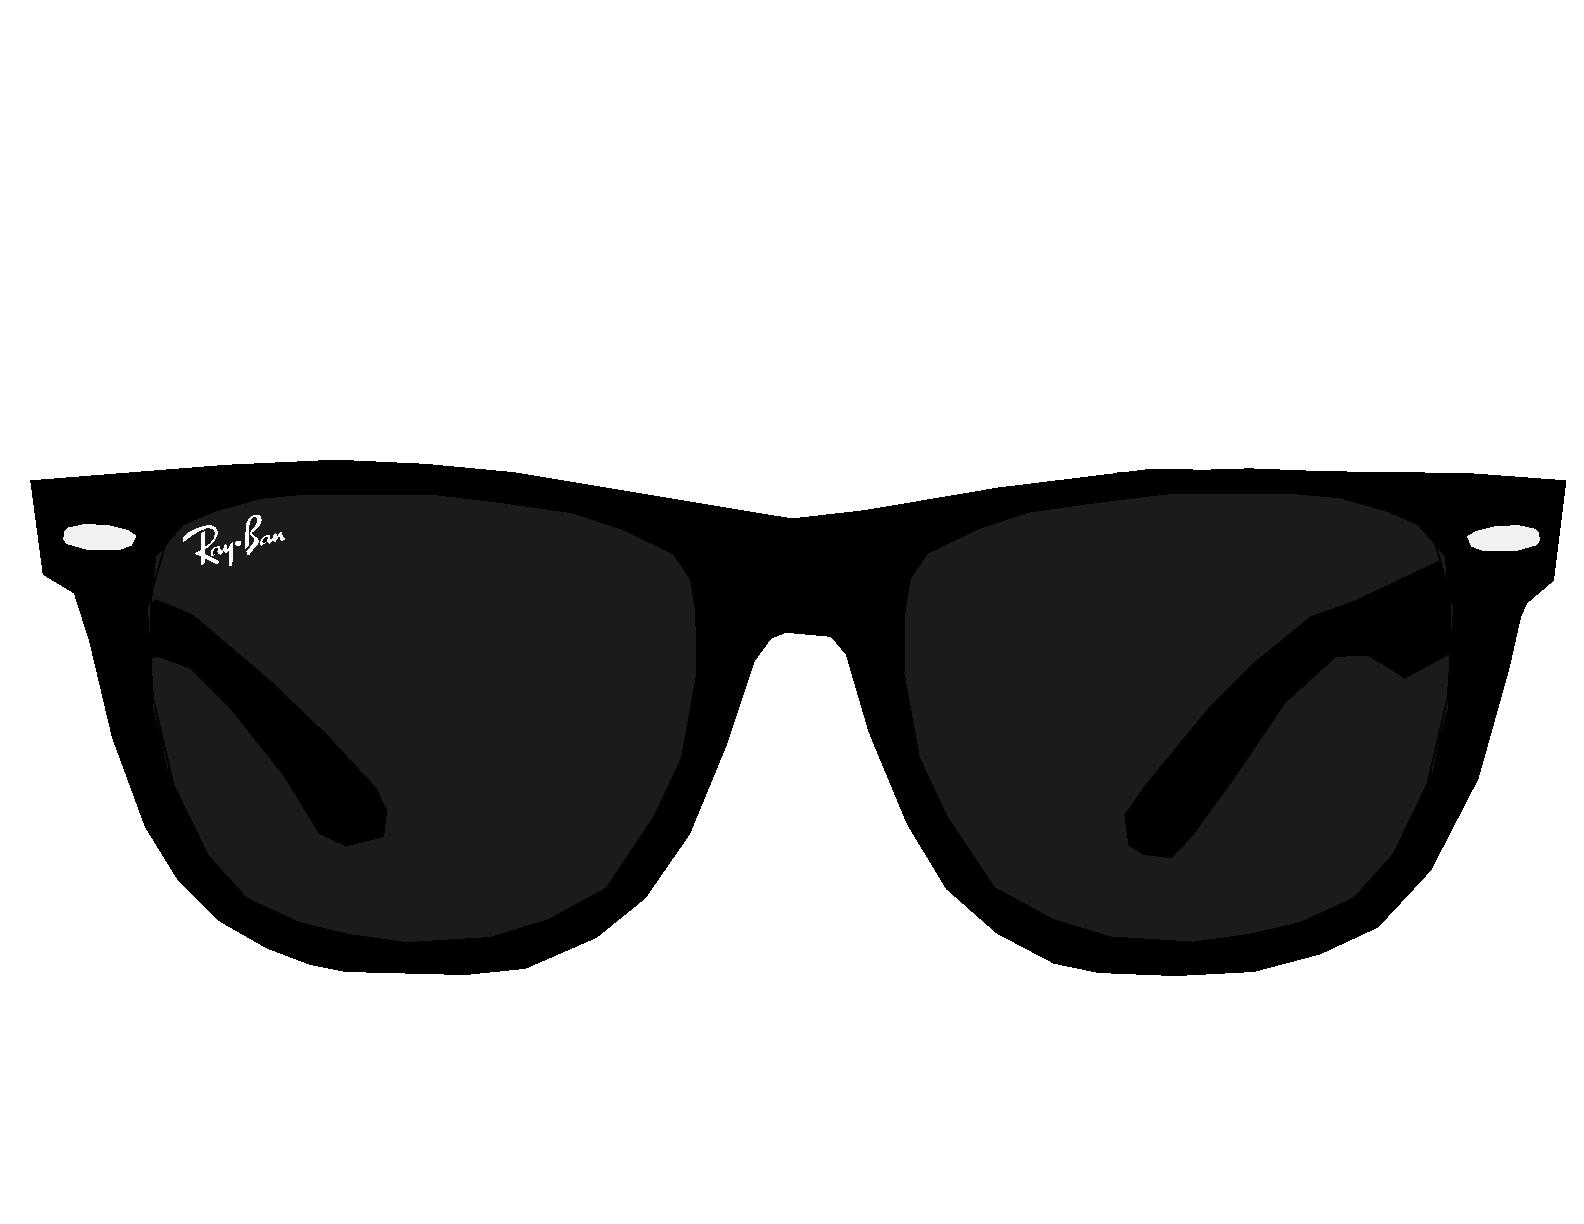 Free sunglass cliparts download. Sunglasses clipart